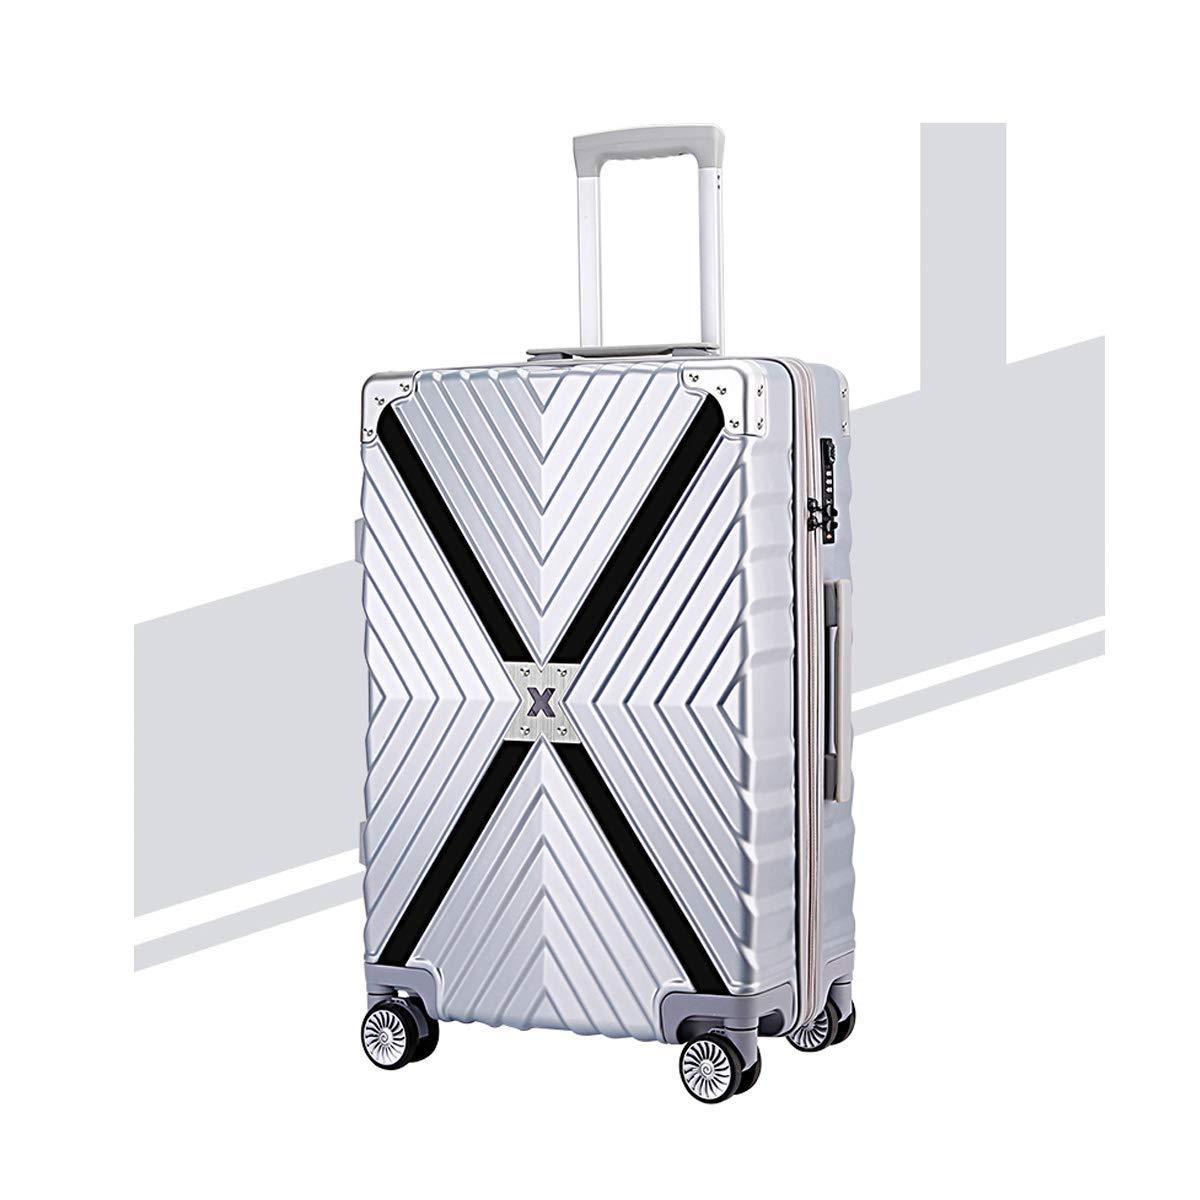 8haowenju Travel Bag, Hard Trolley case, Student Password Box, Simple and, Travel Organizer, 20/24 inch, Silver (Color : Silver, Size : 24) Suitcase (Color : Silver, Size : 20)